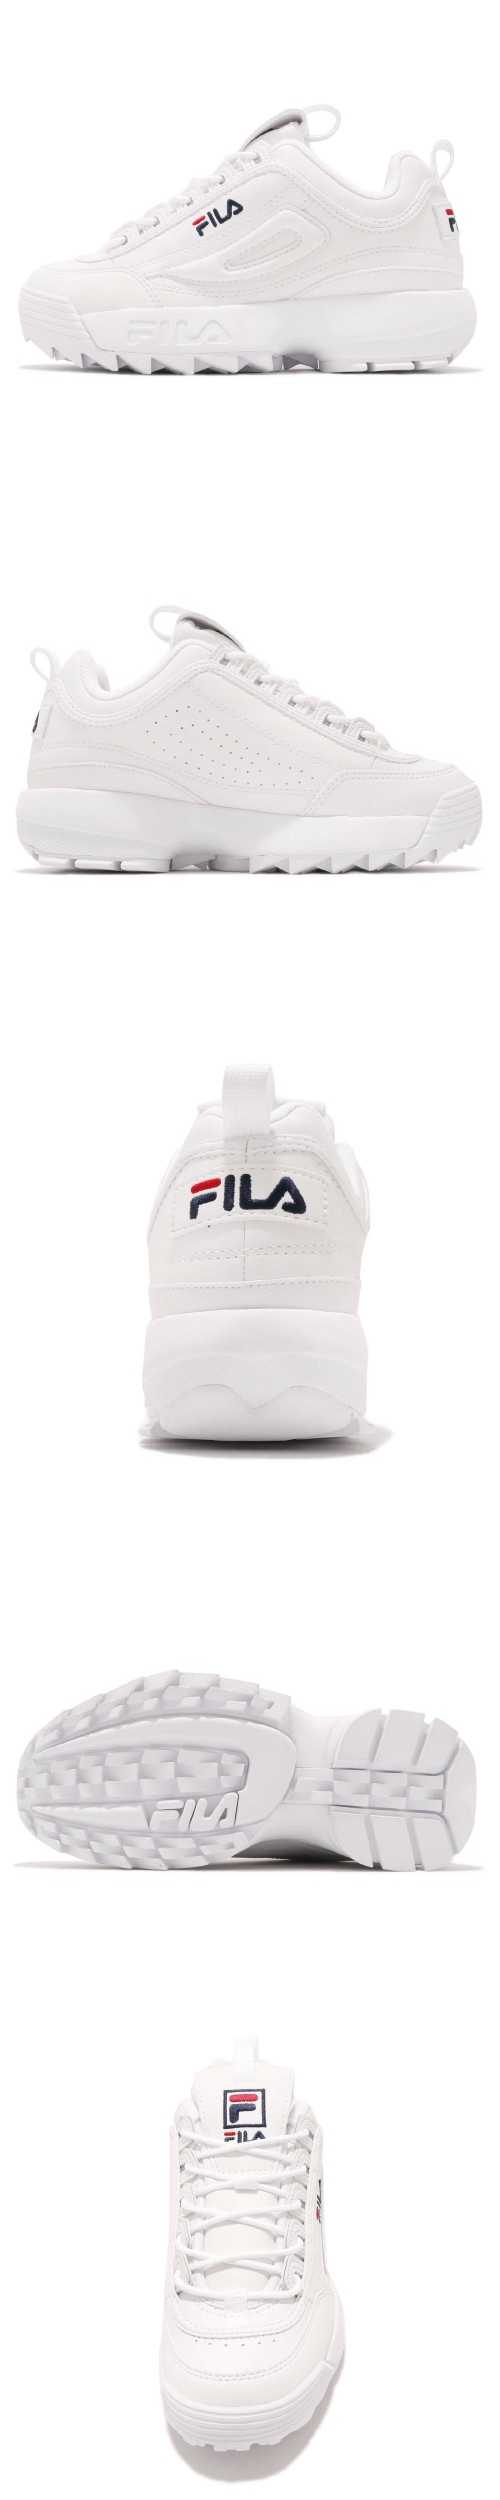 Fila 休閒鞋 Disruptor 2 復古 女鞋